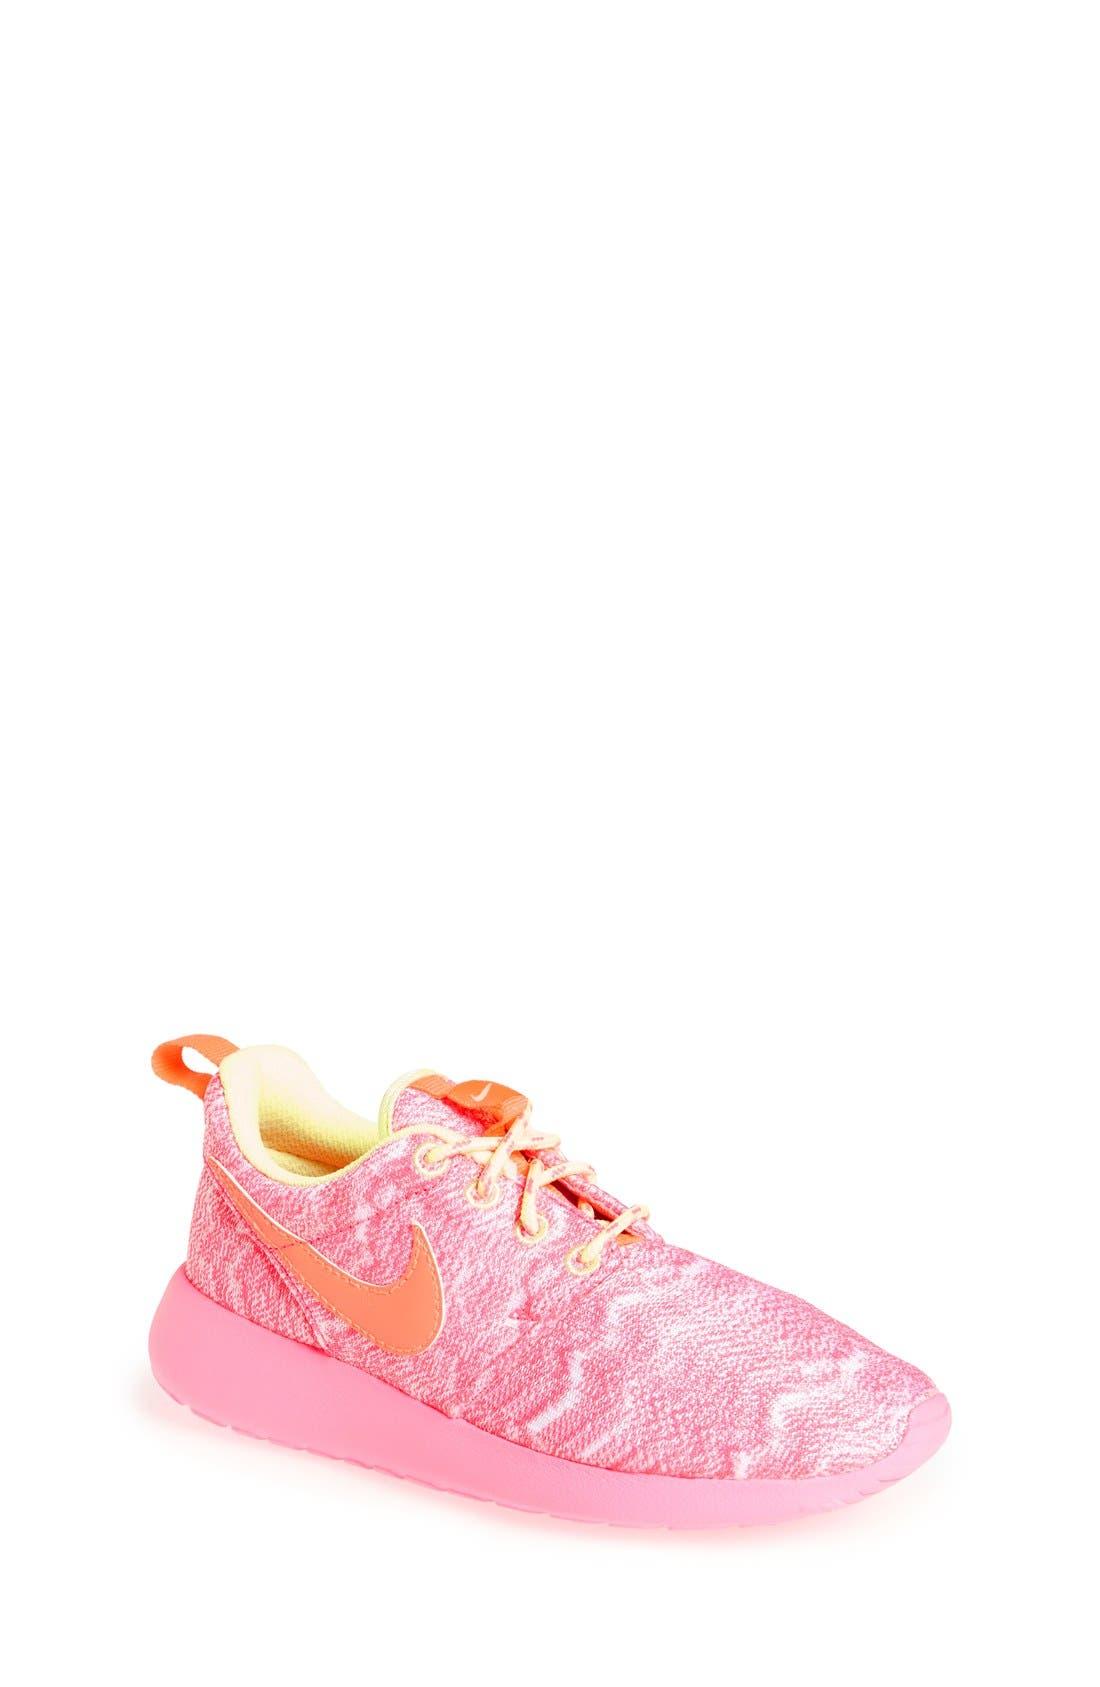 'Roshe Run' Athletic Shoe,                             Main thumbnail 47, color,